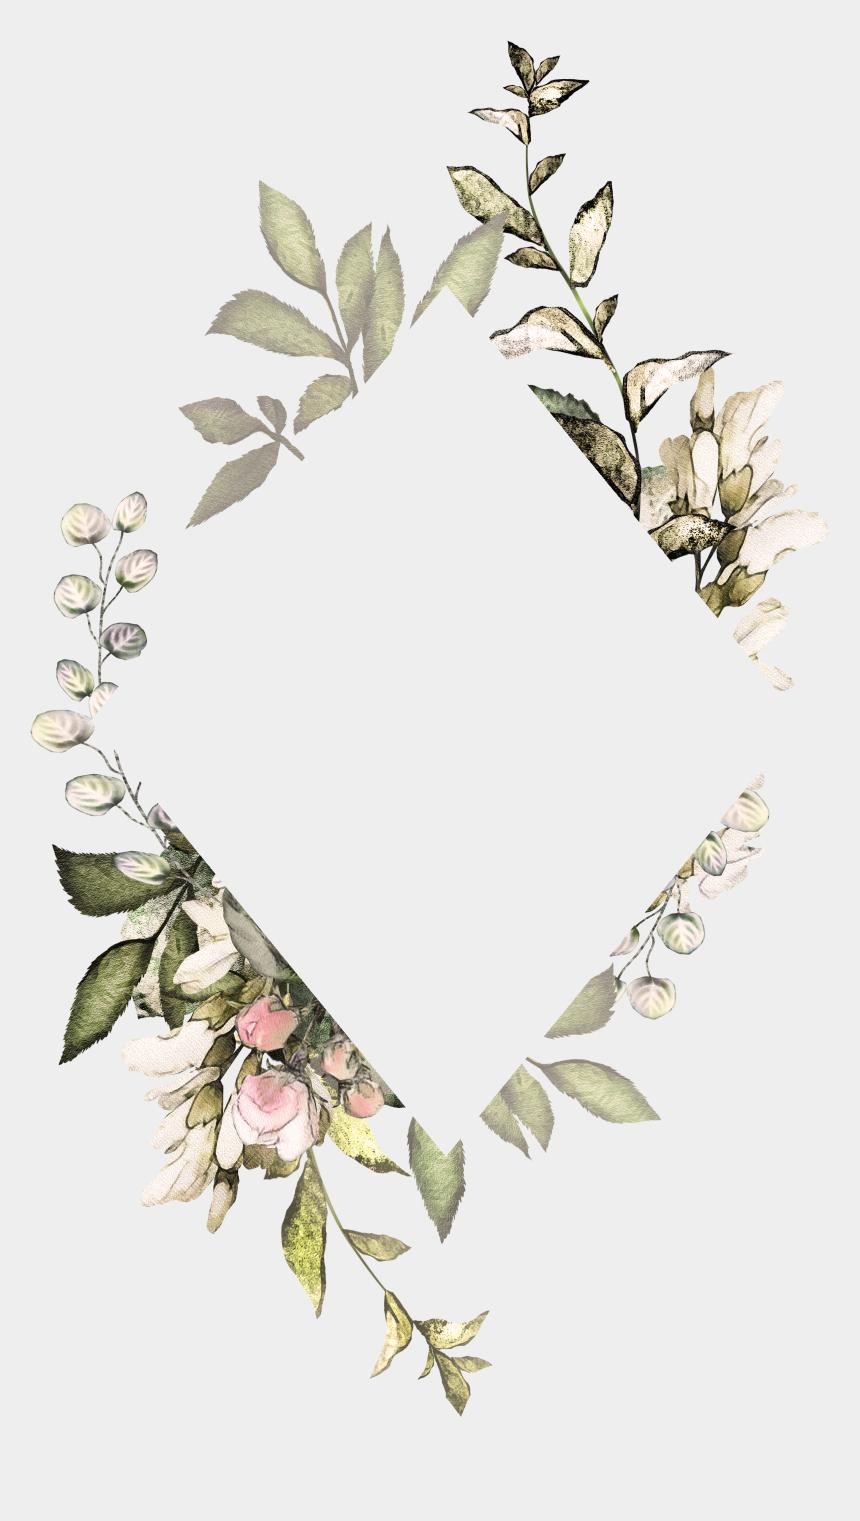 H746a Flower Frame Wallpaper Backgrounds Cute Wallpapers